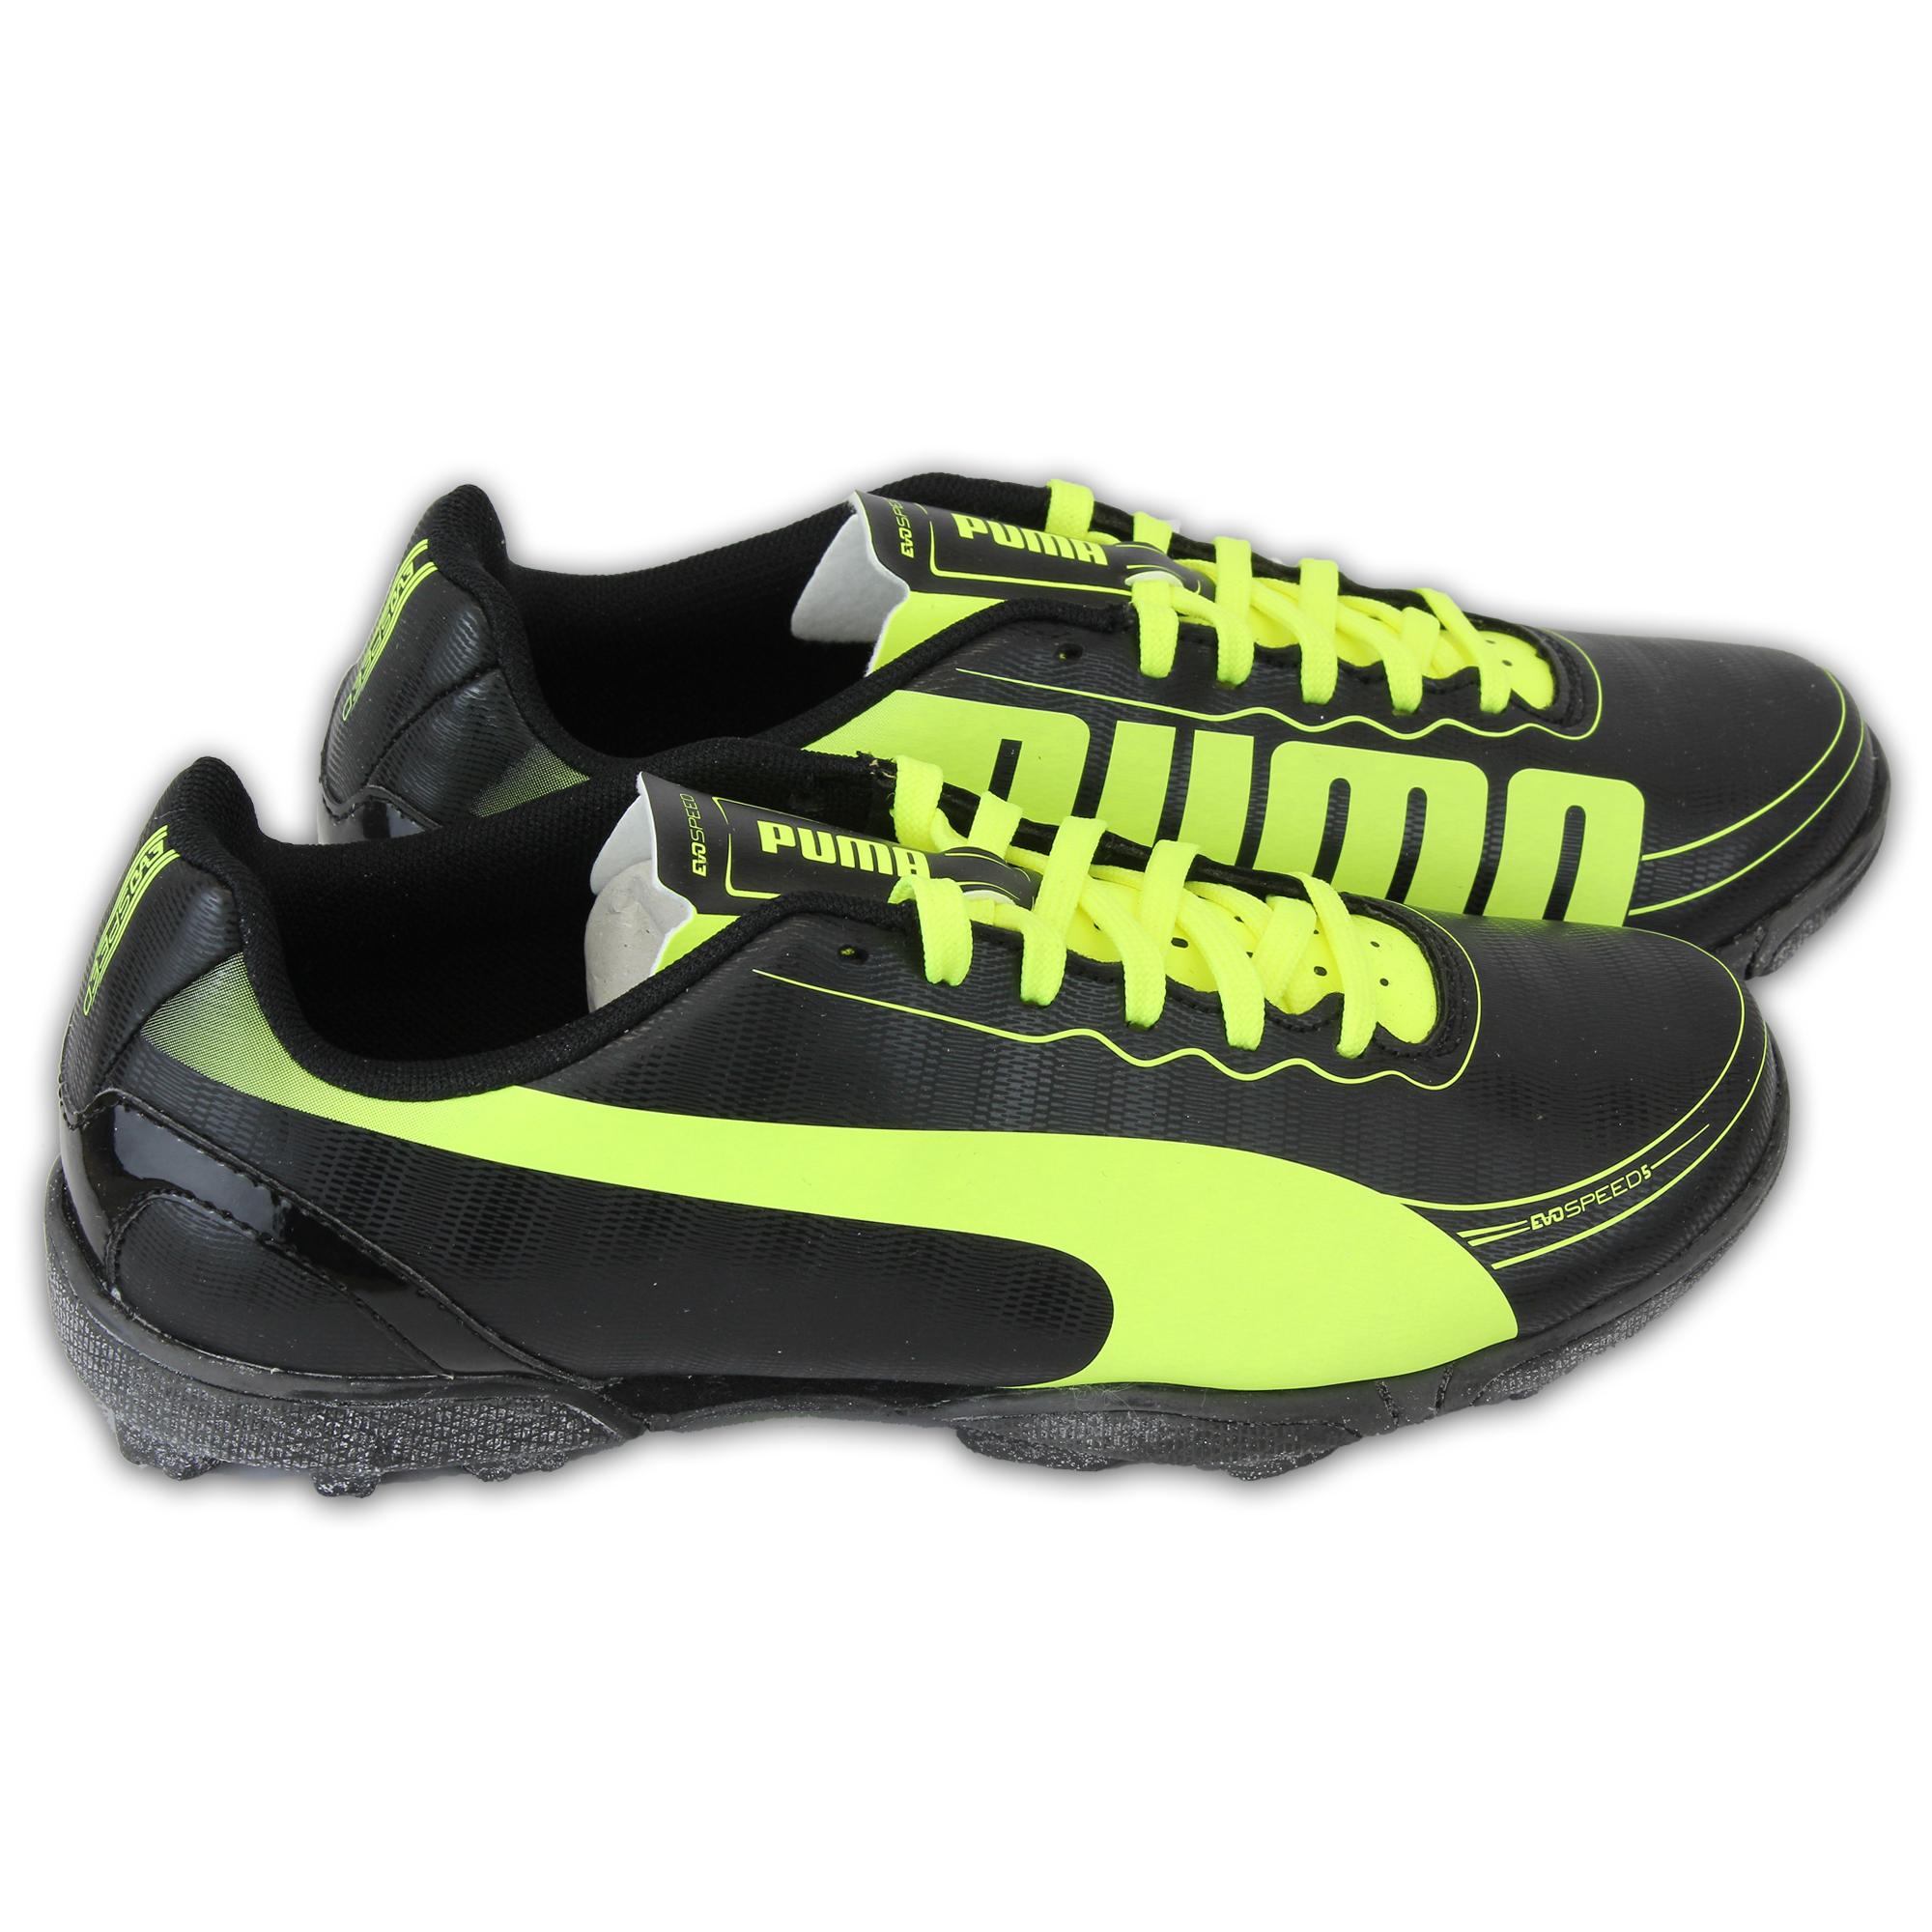 Tt Football Original Shoes About Evospeed Title Kids Lace Puma 5 Boys Trainers Details Up Show Astroturf 2 UzSpGqMV